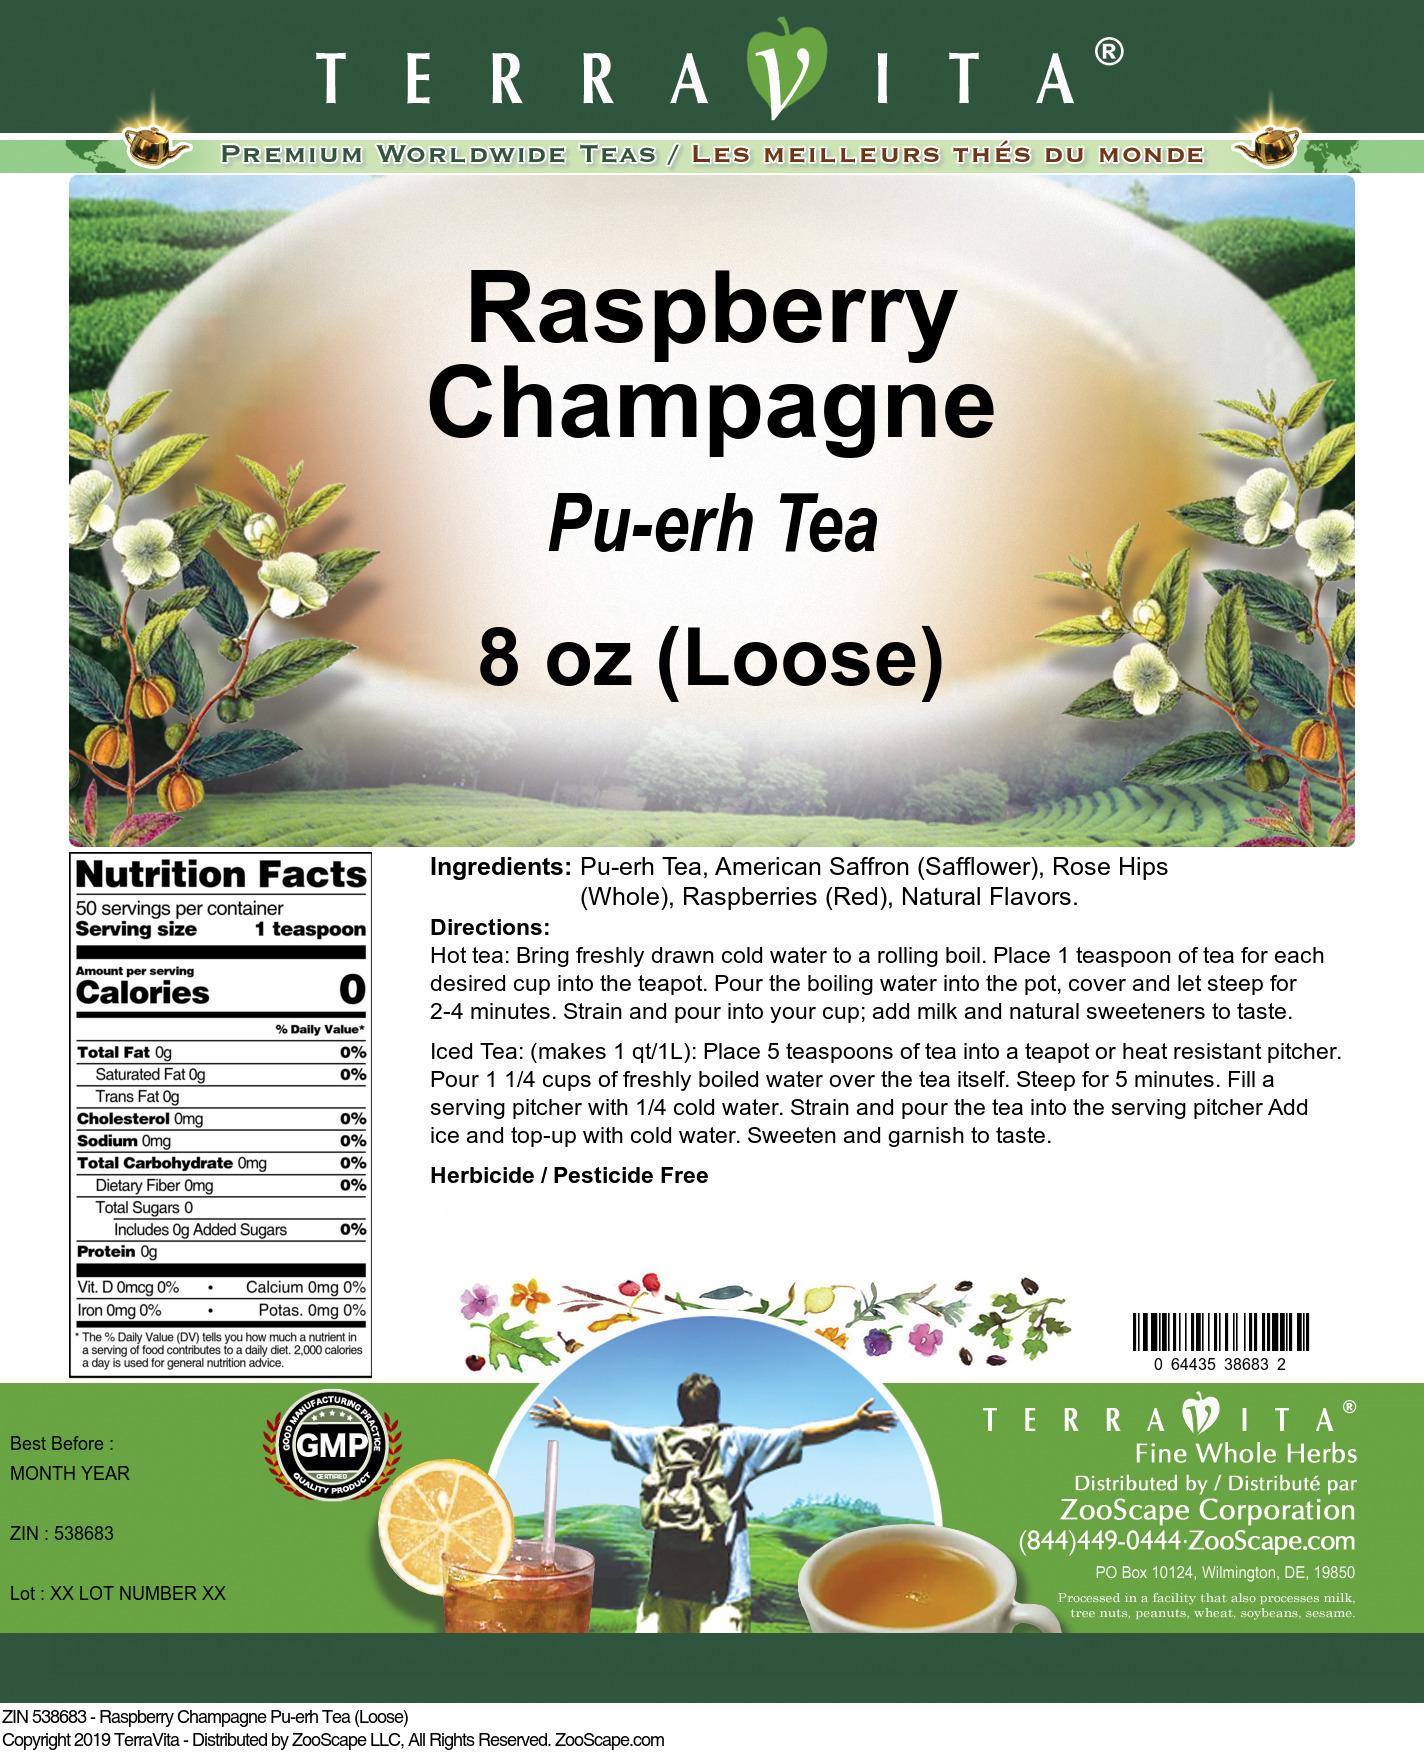 Raspberry Champagne Pu-erh Tea